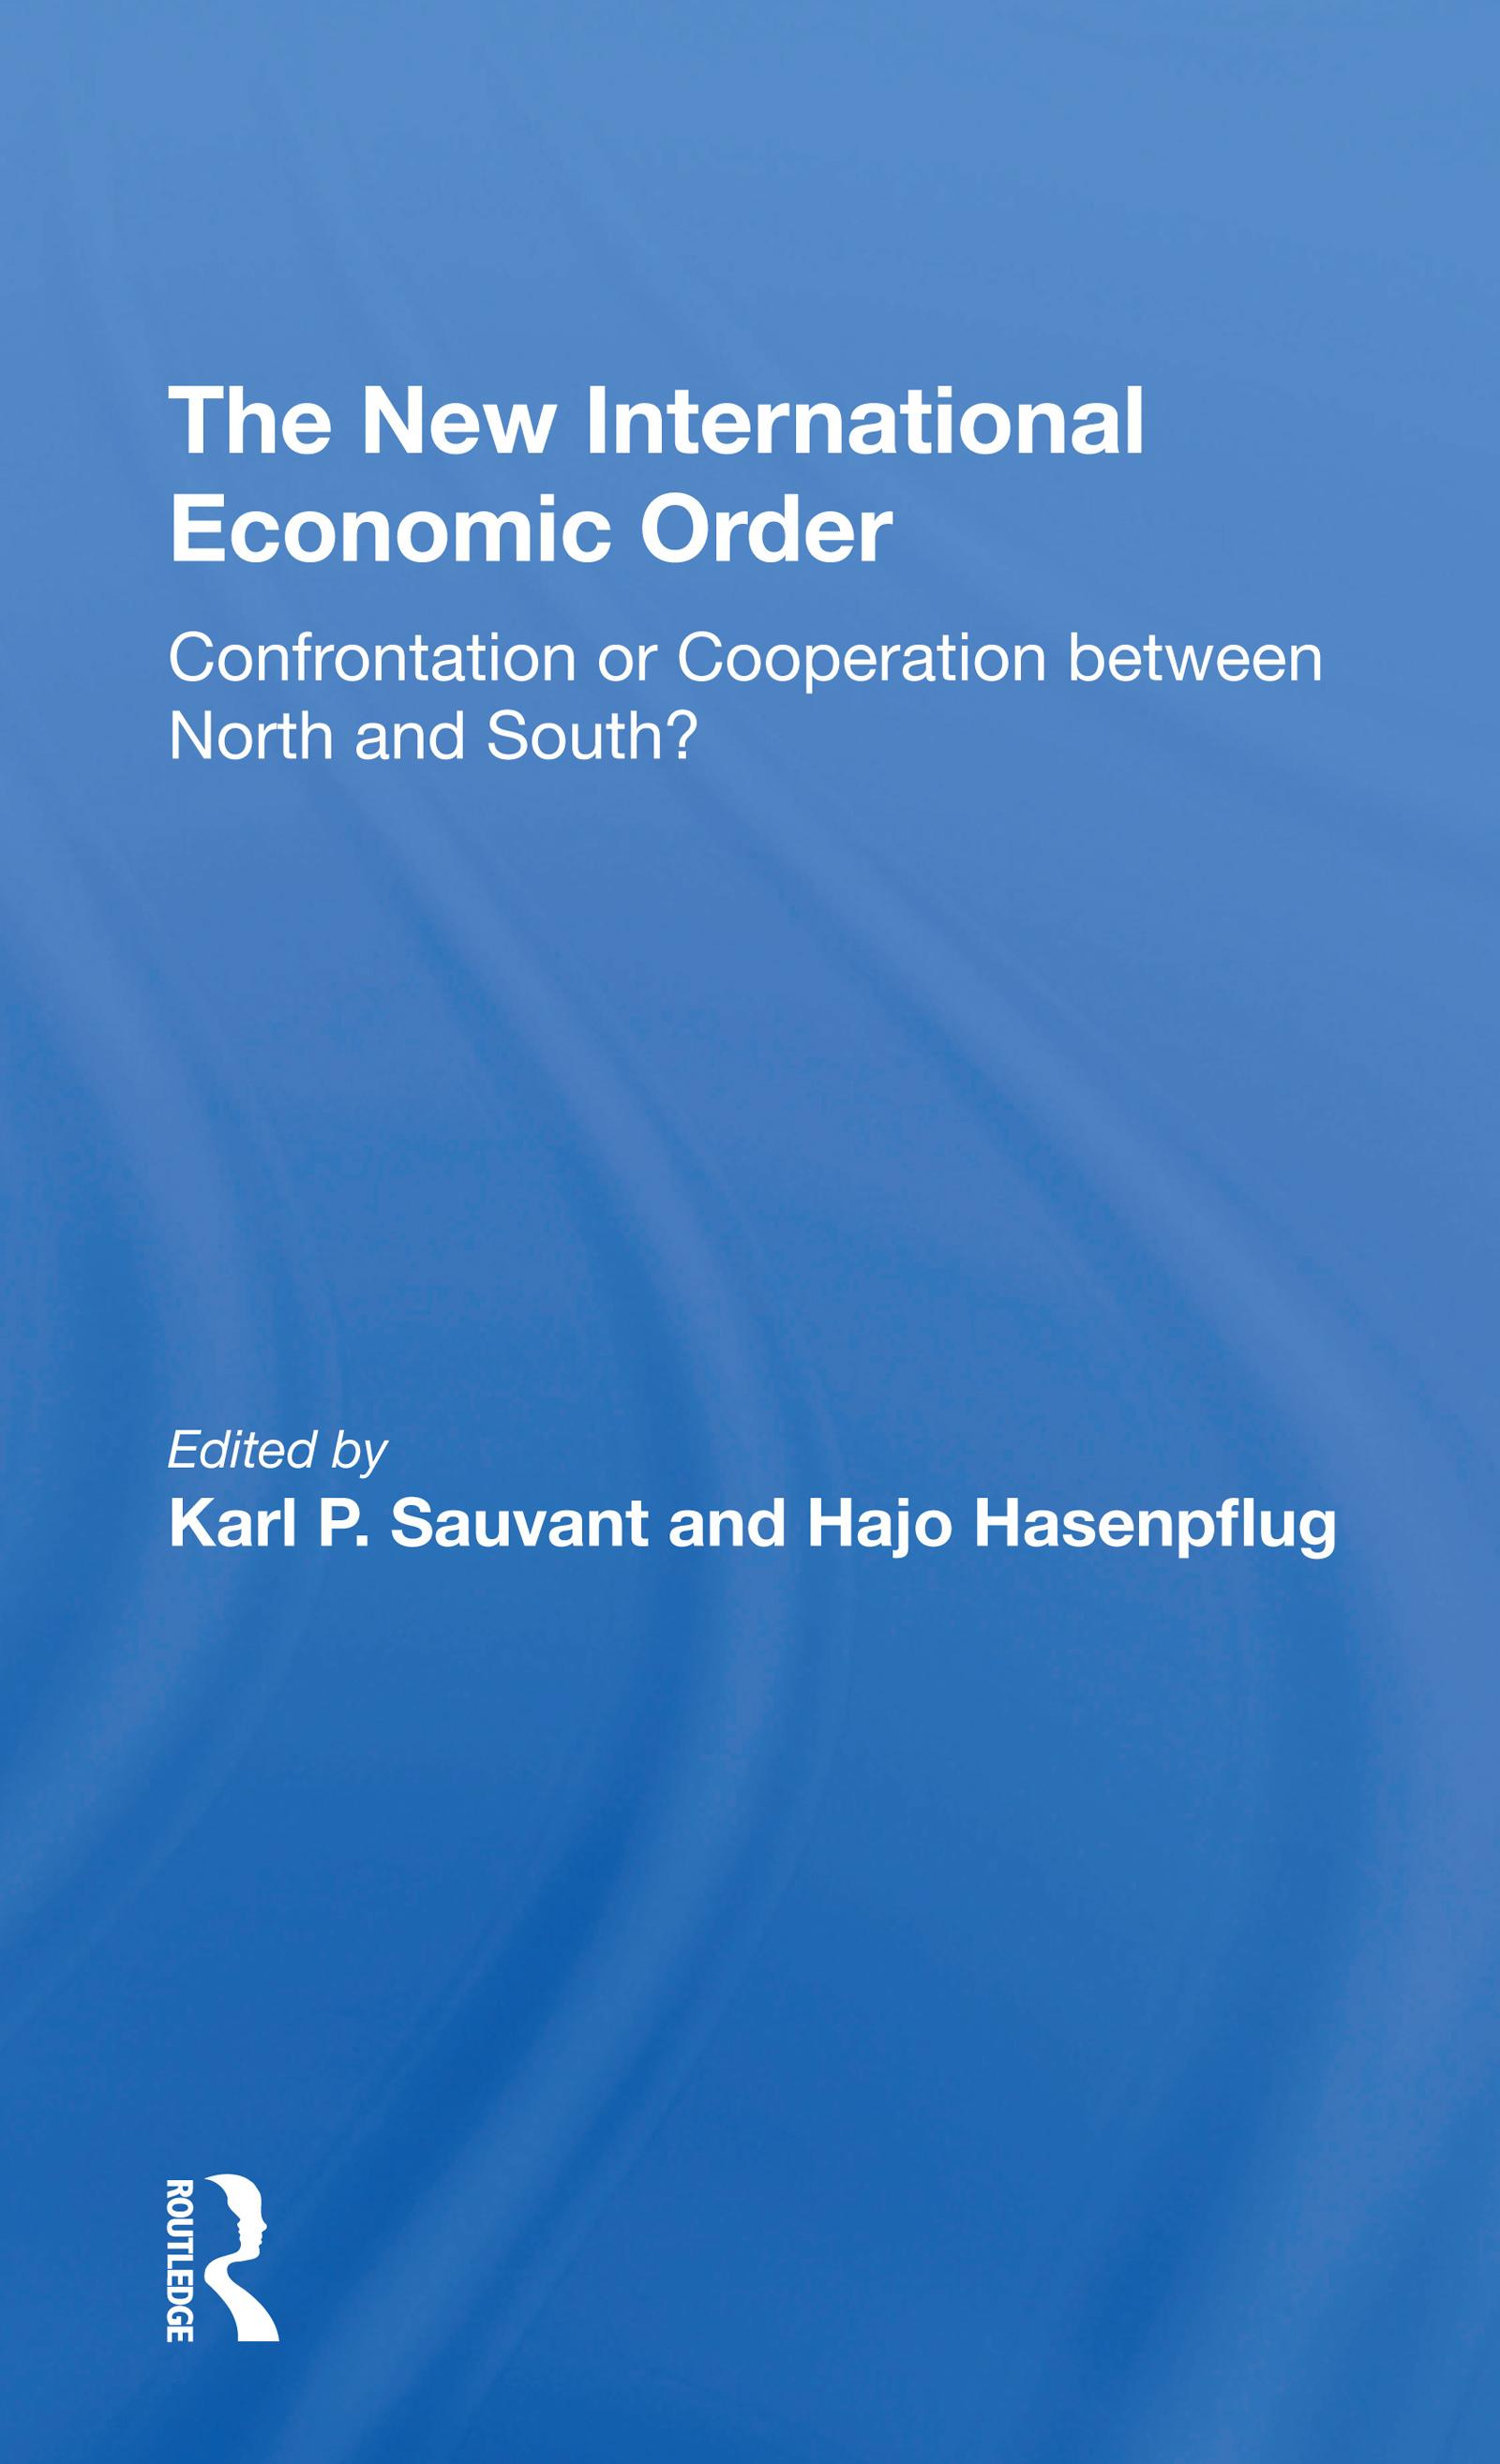 Development and International Economic Co-operation